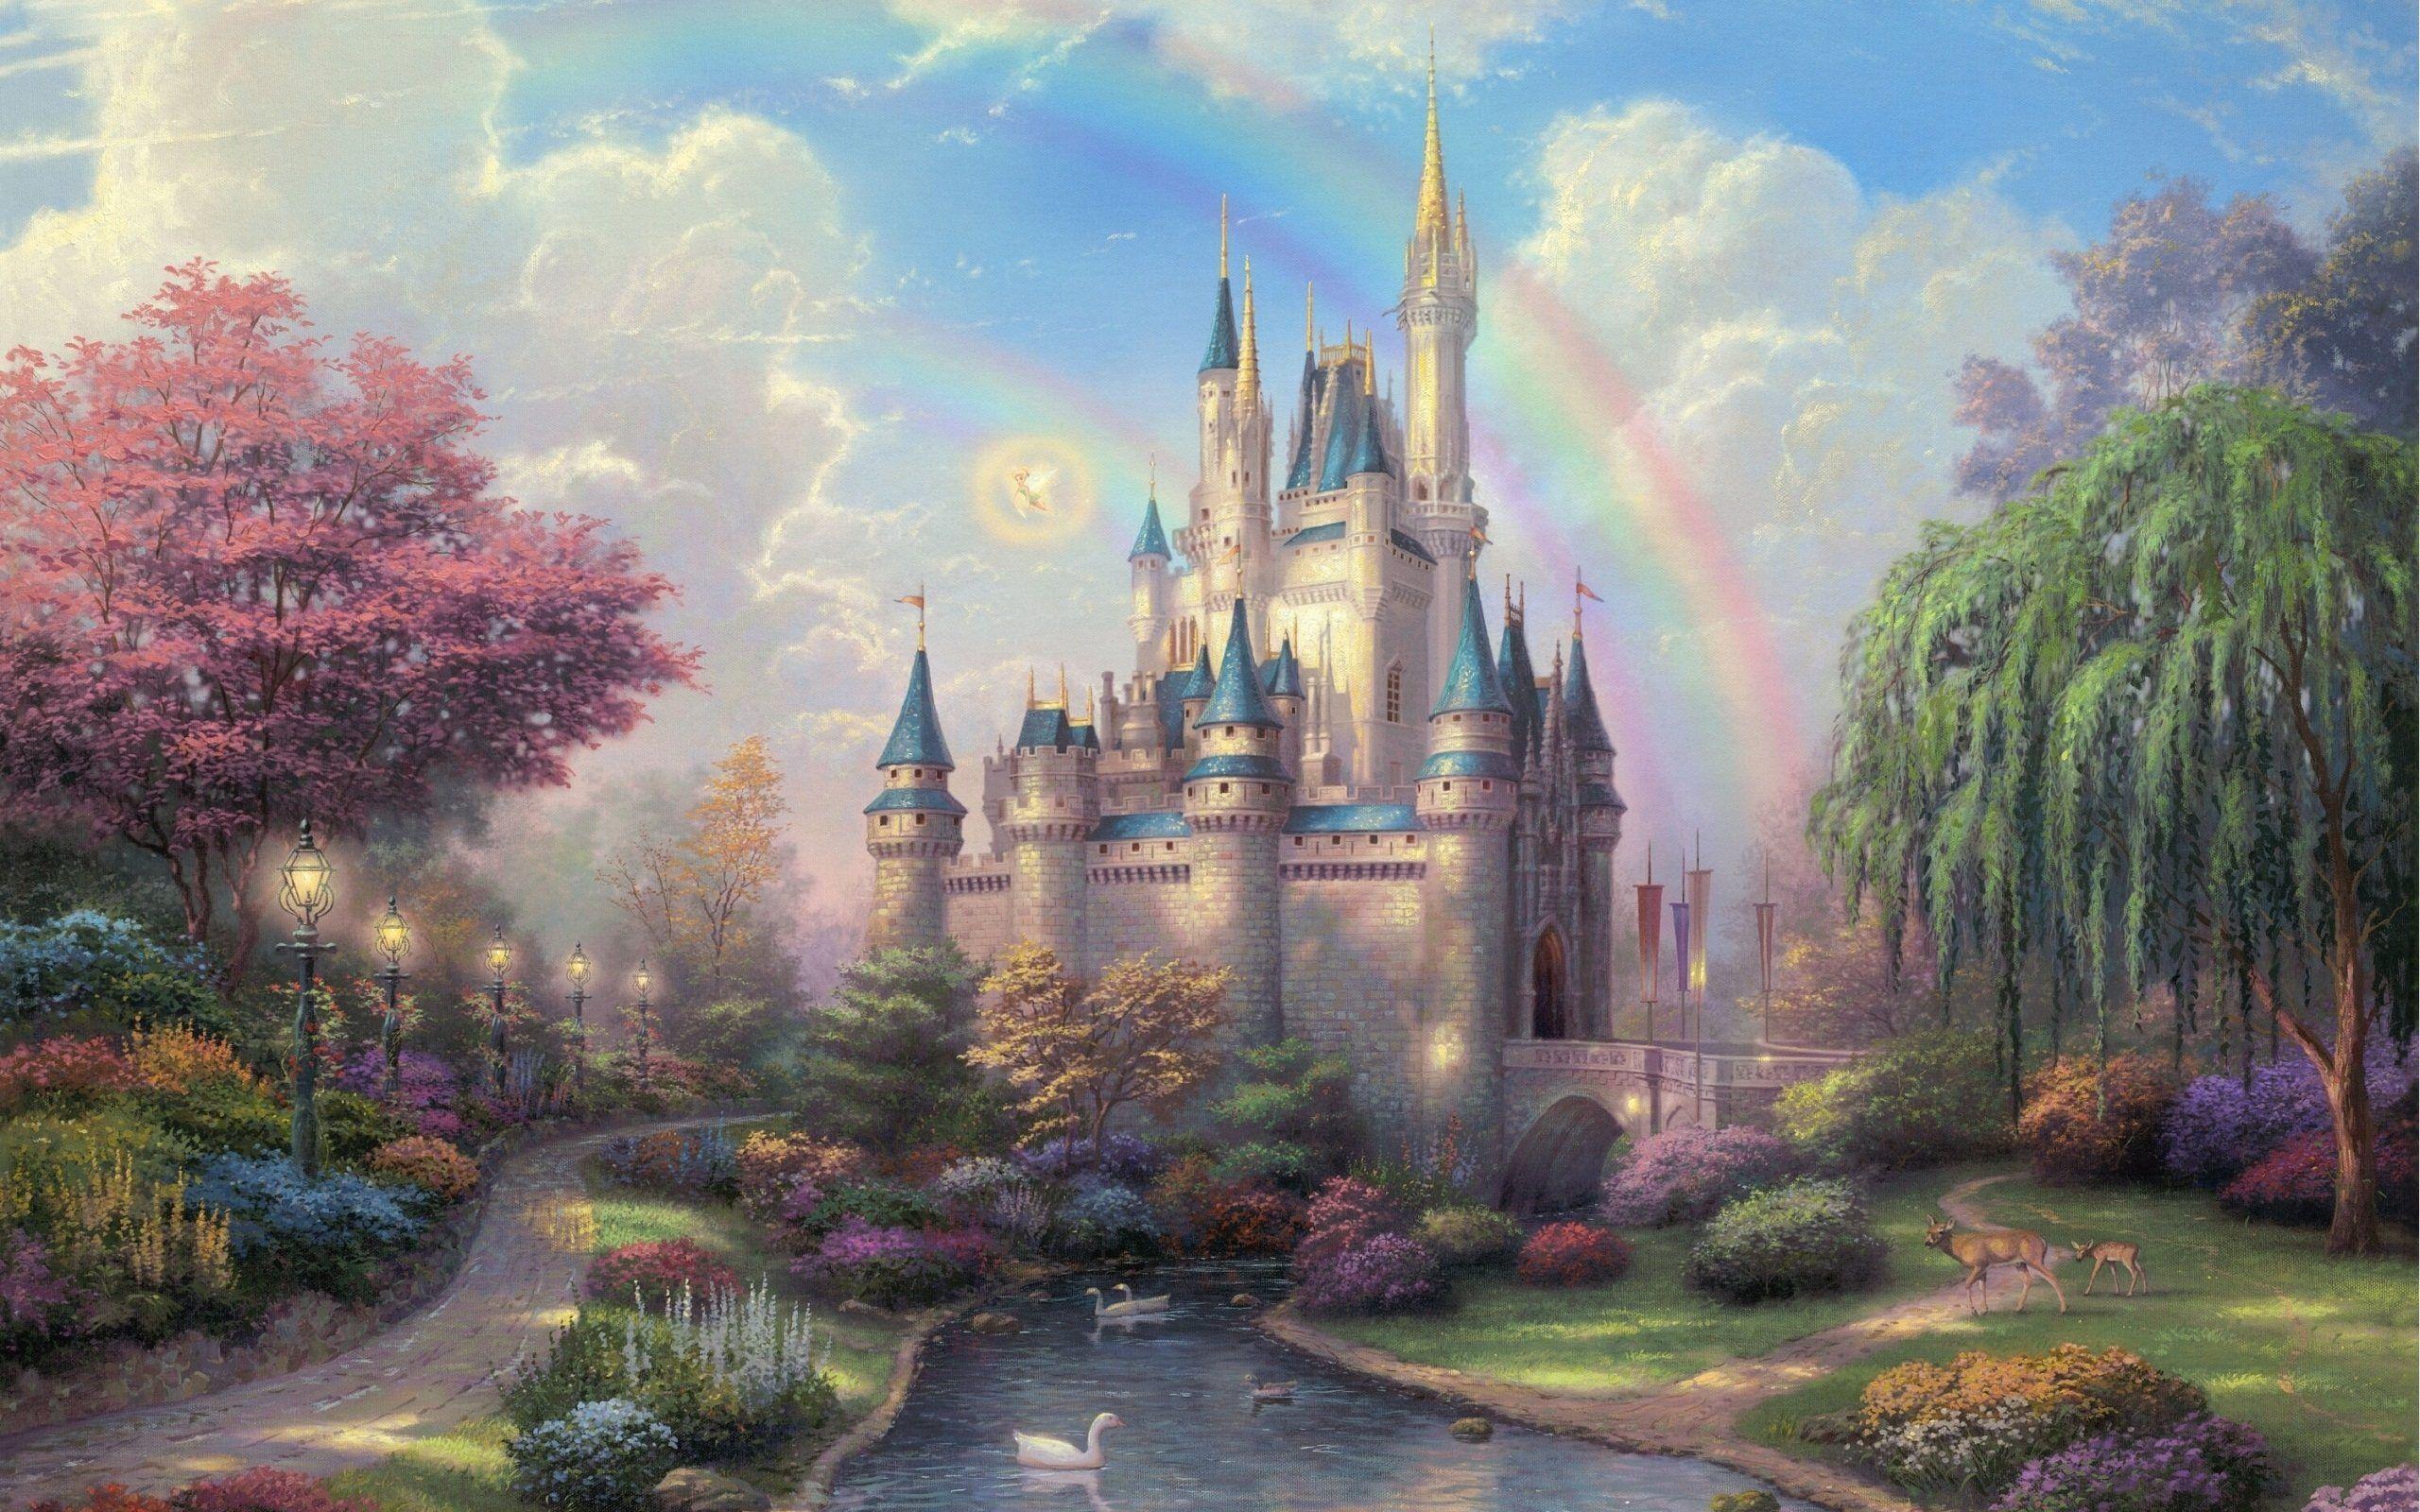 Thomas Kinkade Cinderella Castle Wallpaper